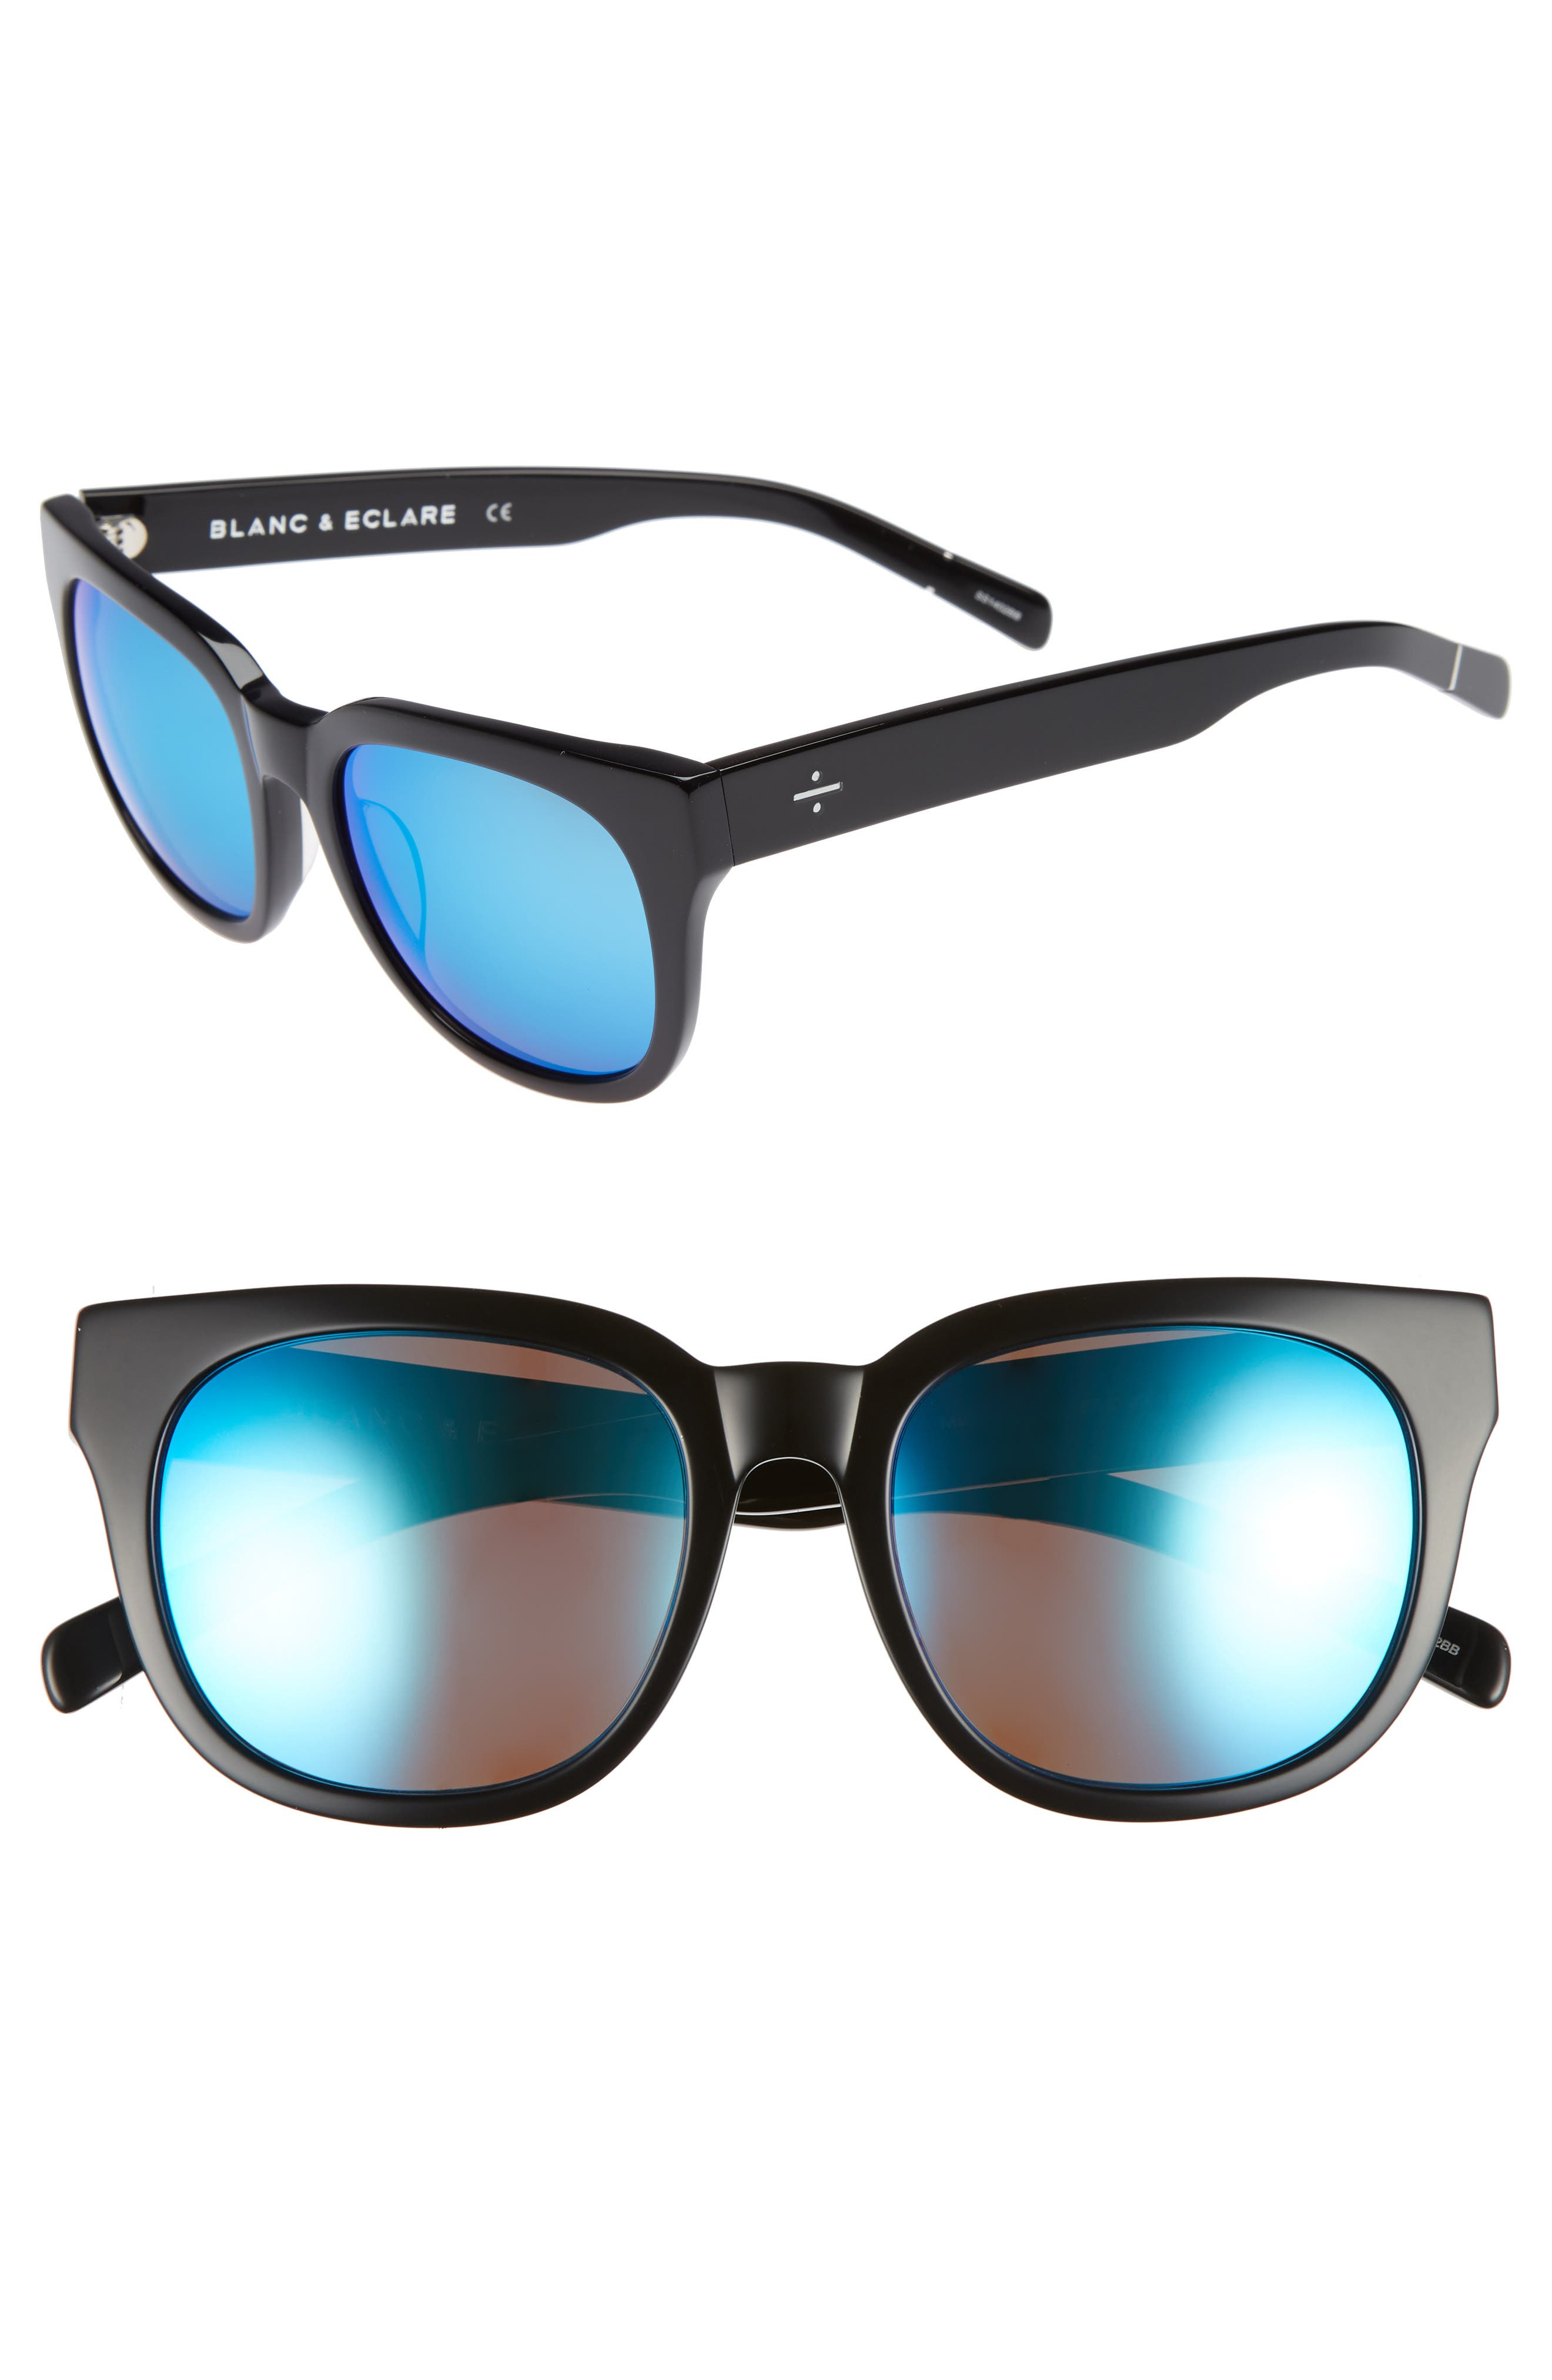 BLANC & ECLARE Seoul 55mm Polarized Sunglasses,                         Main,                         color, 002